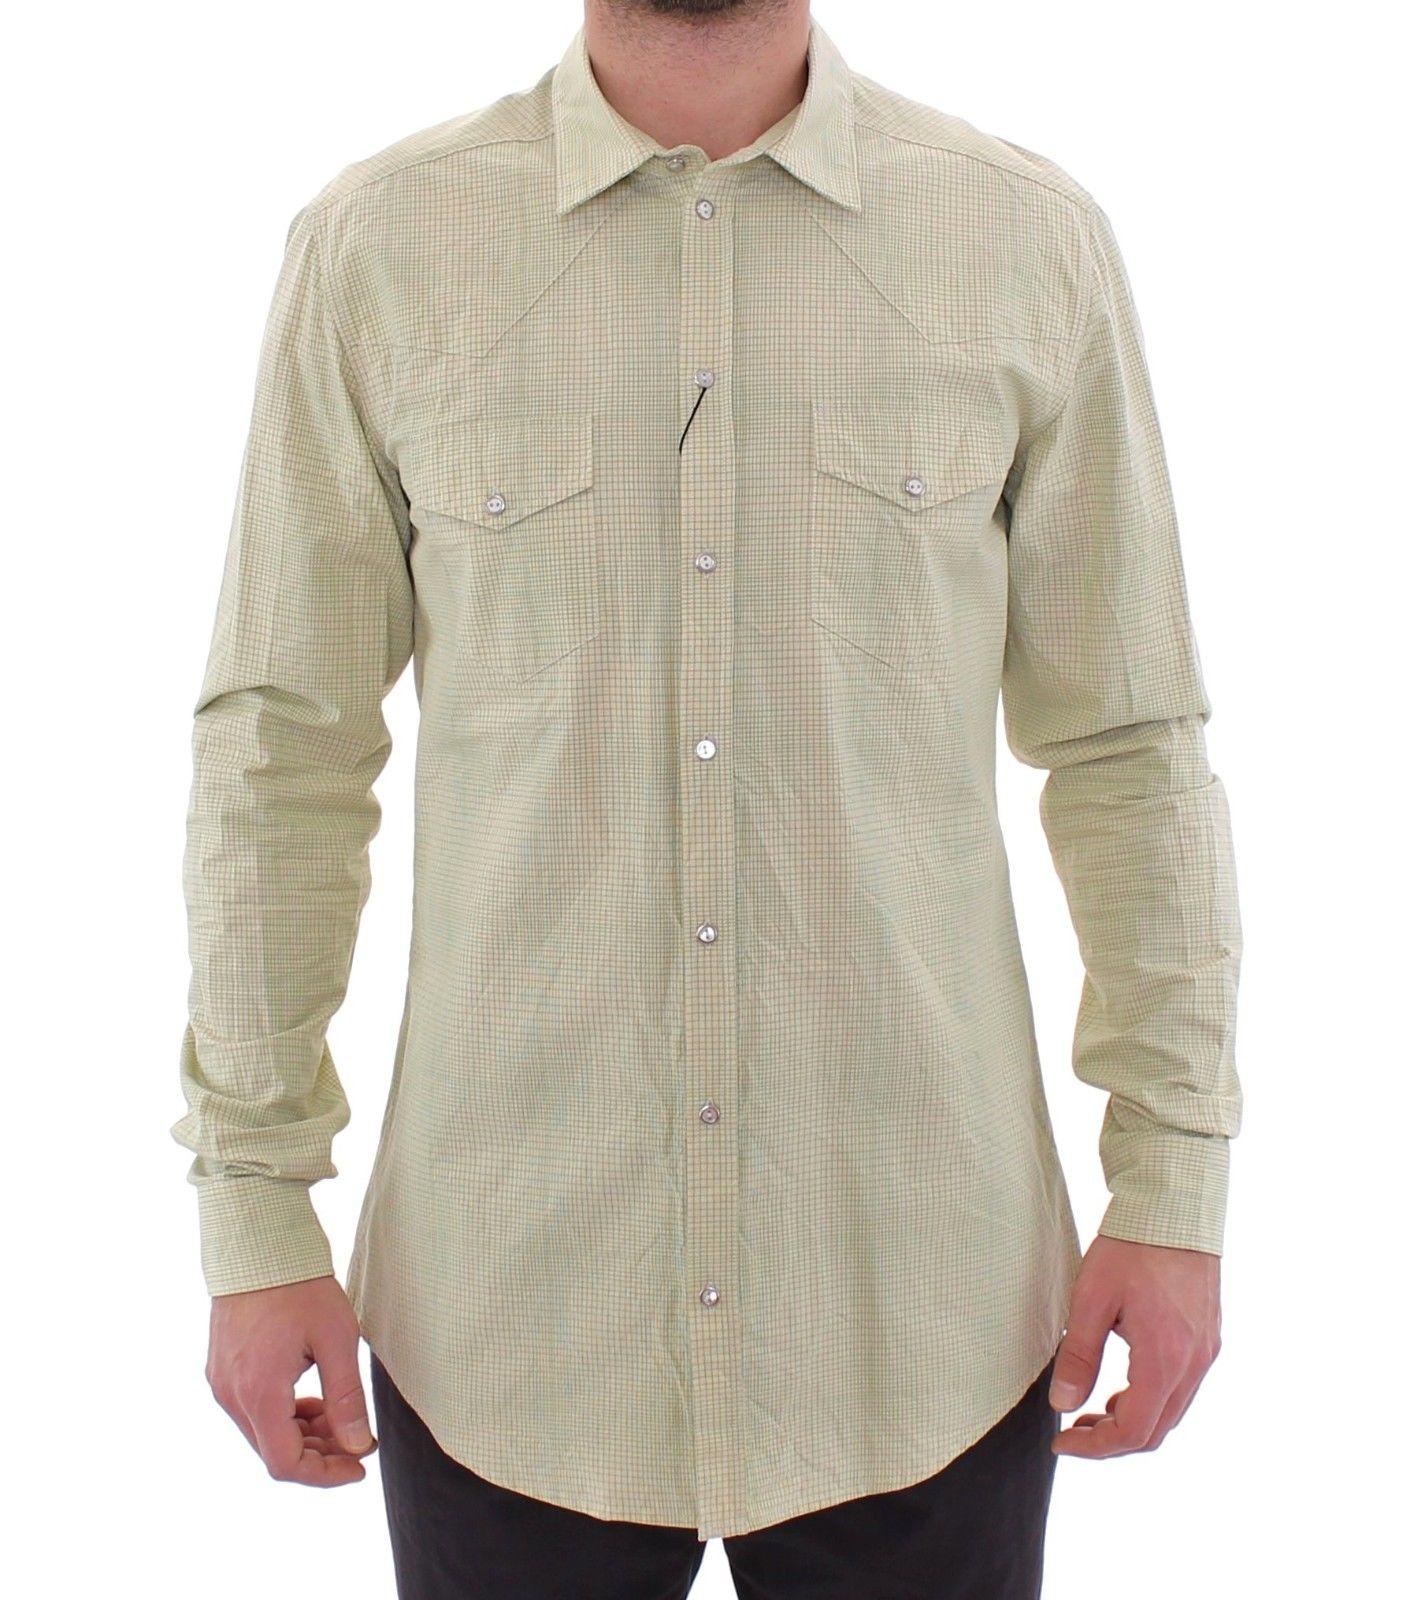 Dolce & Gabbana Men's Checkered SICILIA Casual Shirt Yellow GSS15041 - 39